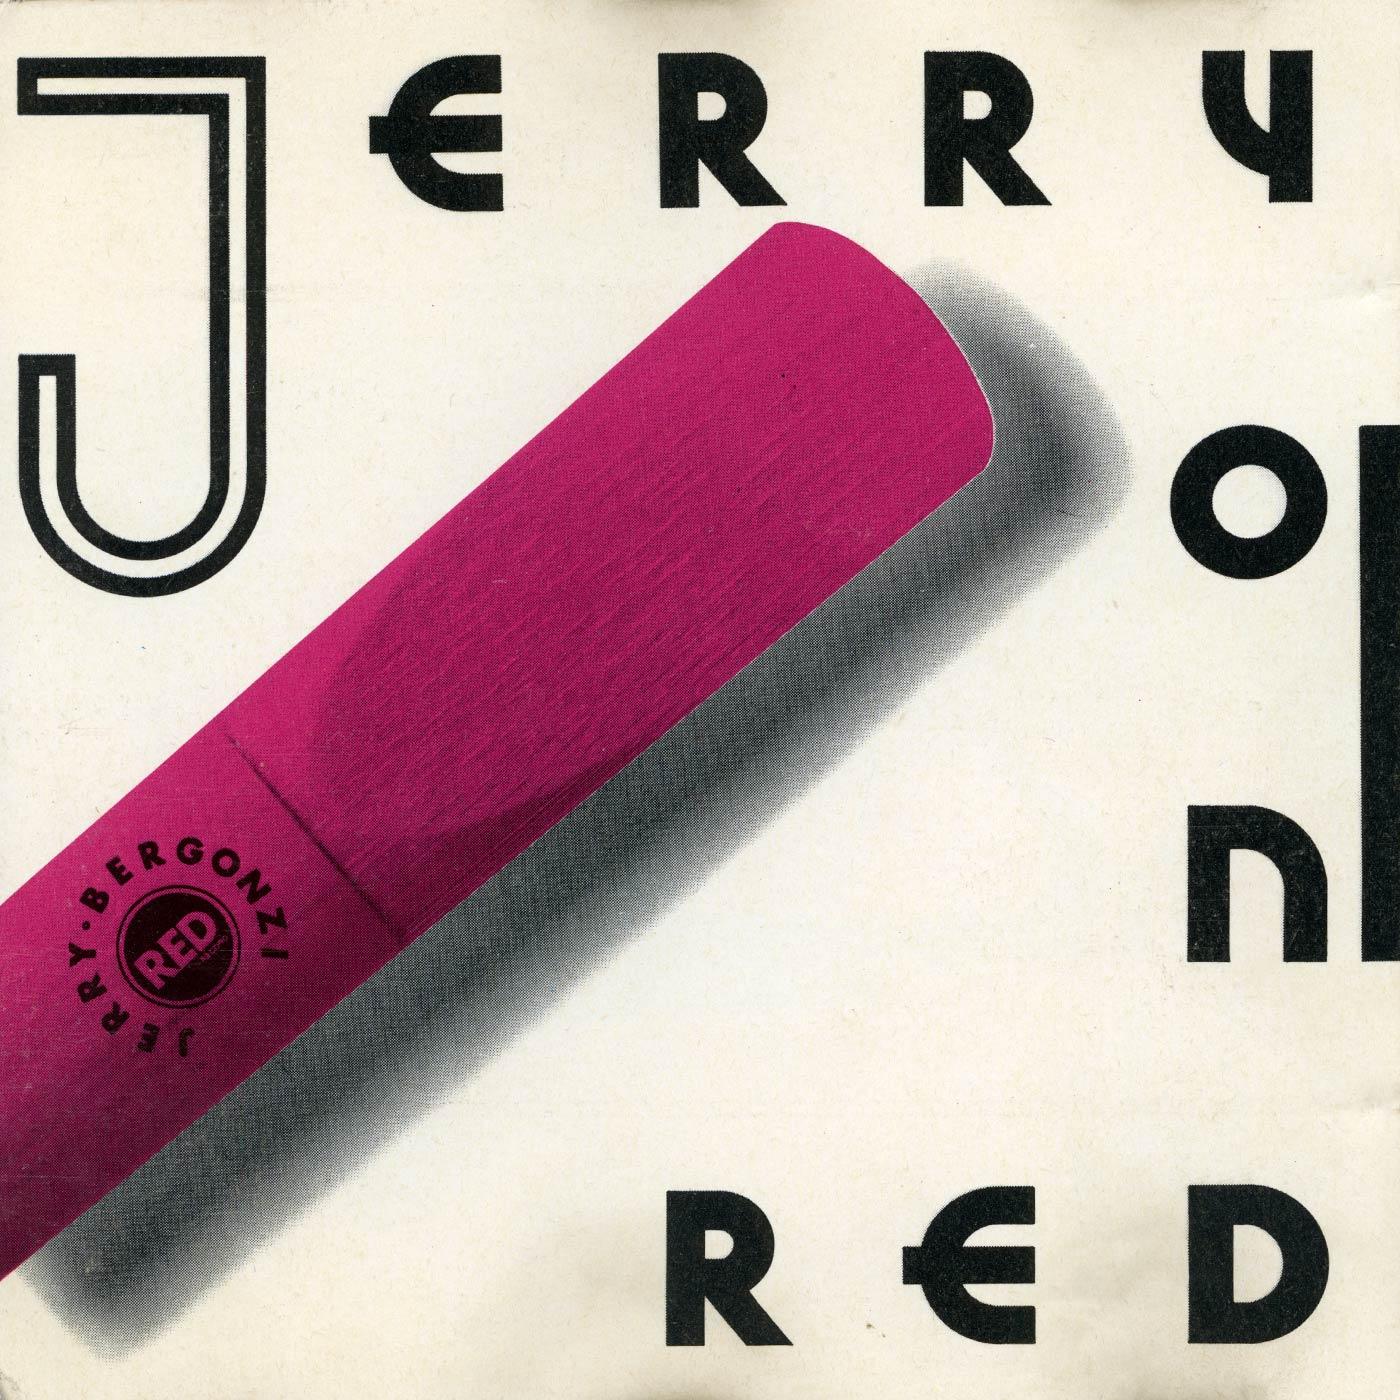 Jerry On Red - Jerry Bergonzi